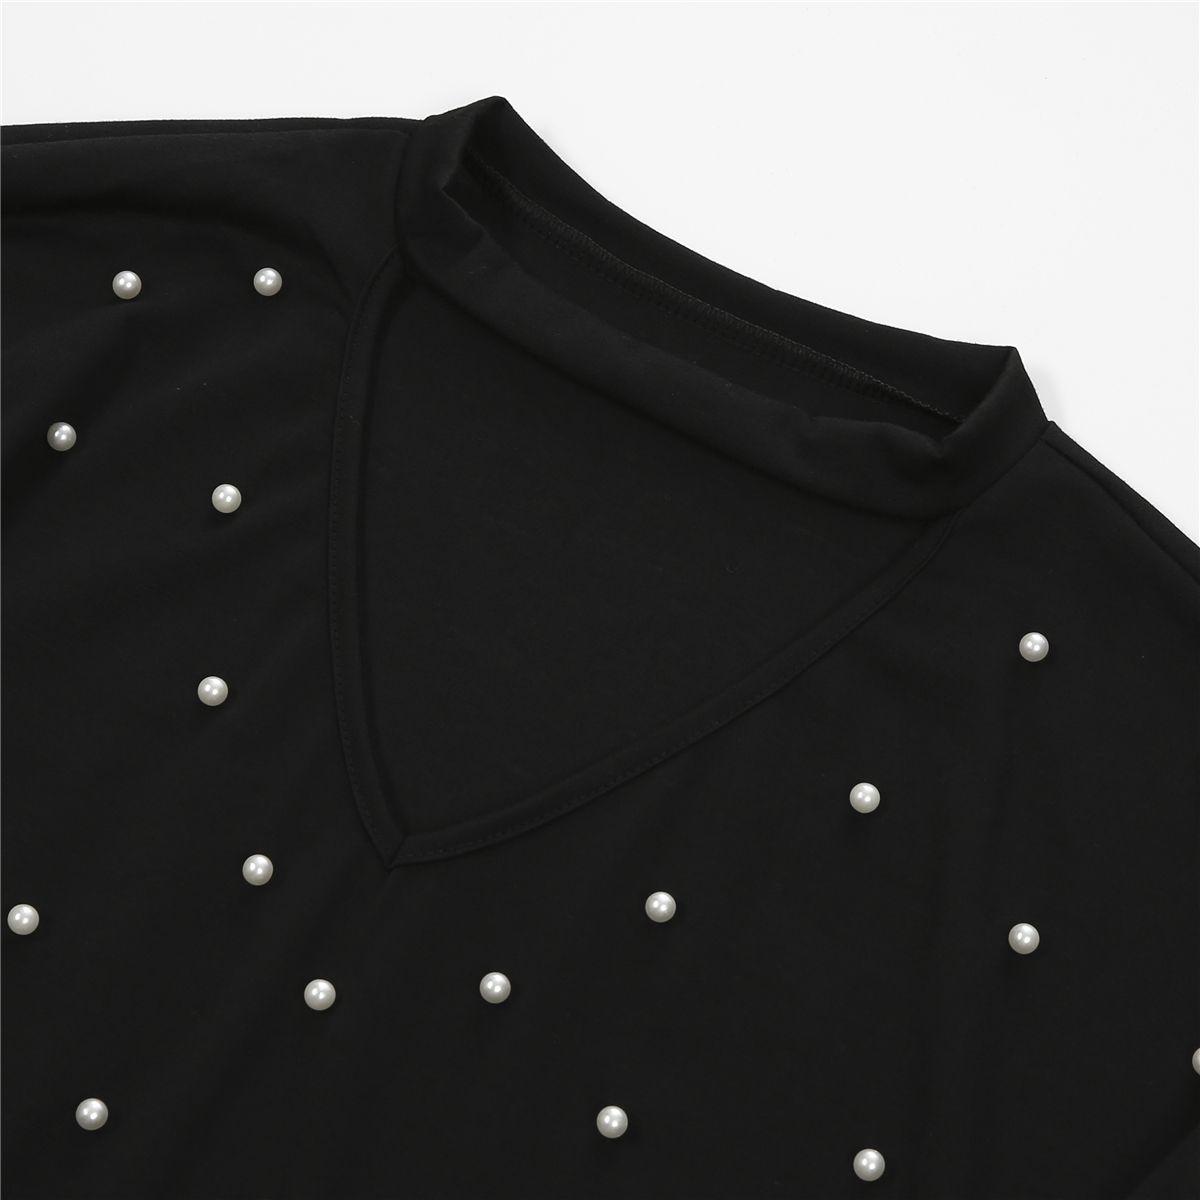 Mulheres Moda Pérola Beading V Cut Choker Casual T-shirt manga comprida Tops Tops Cut senhoras